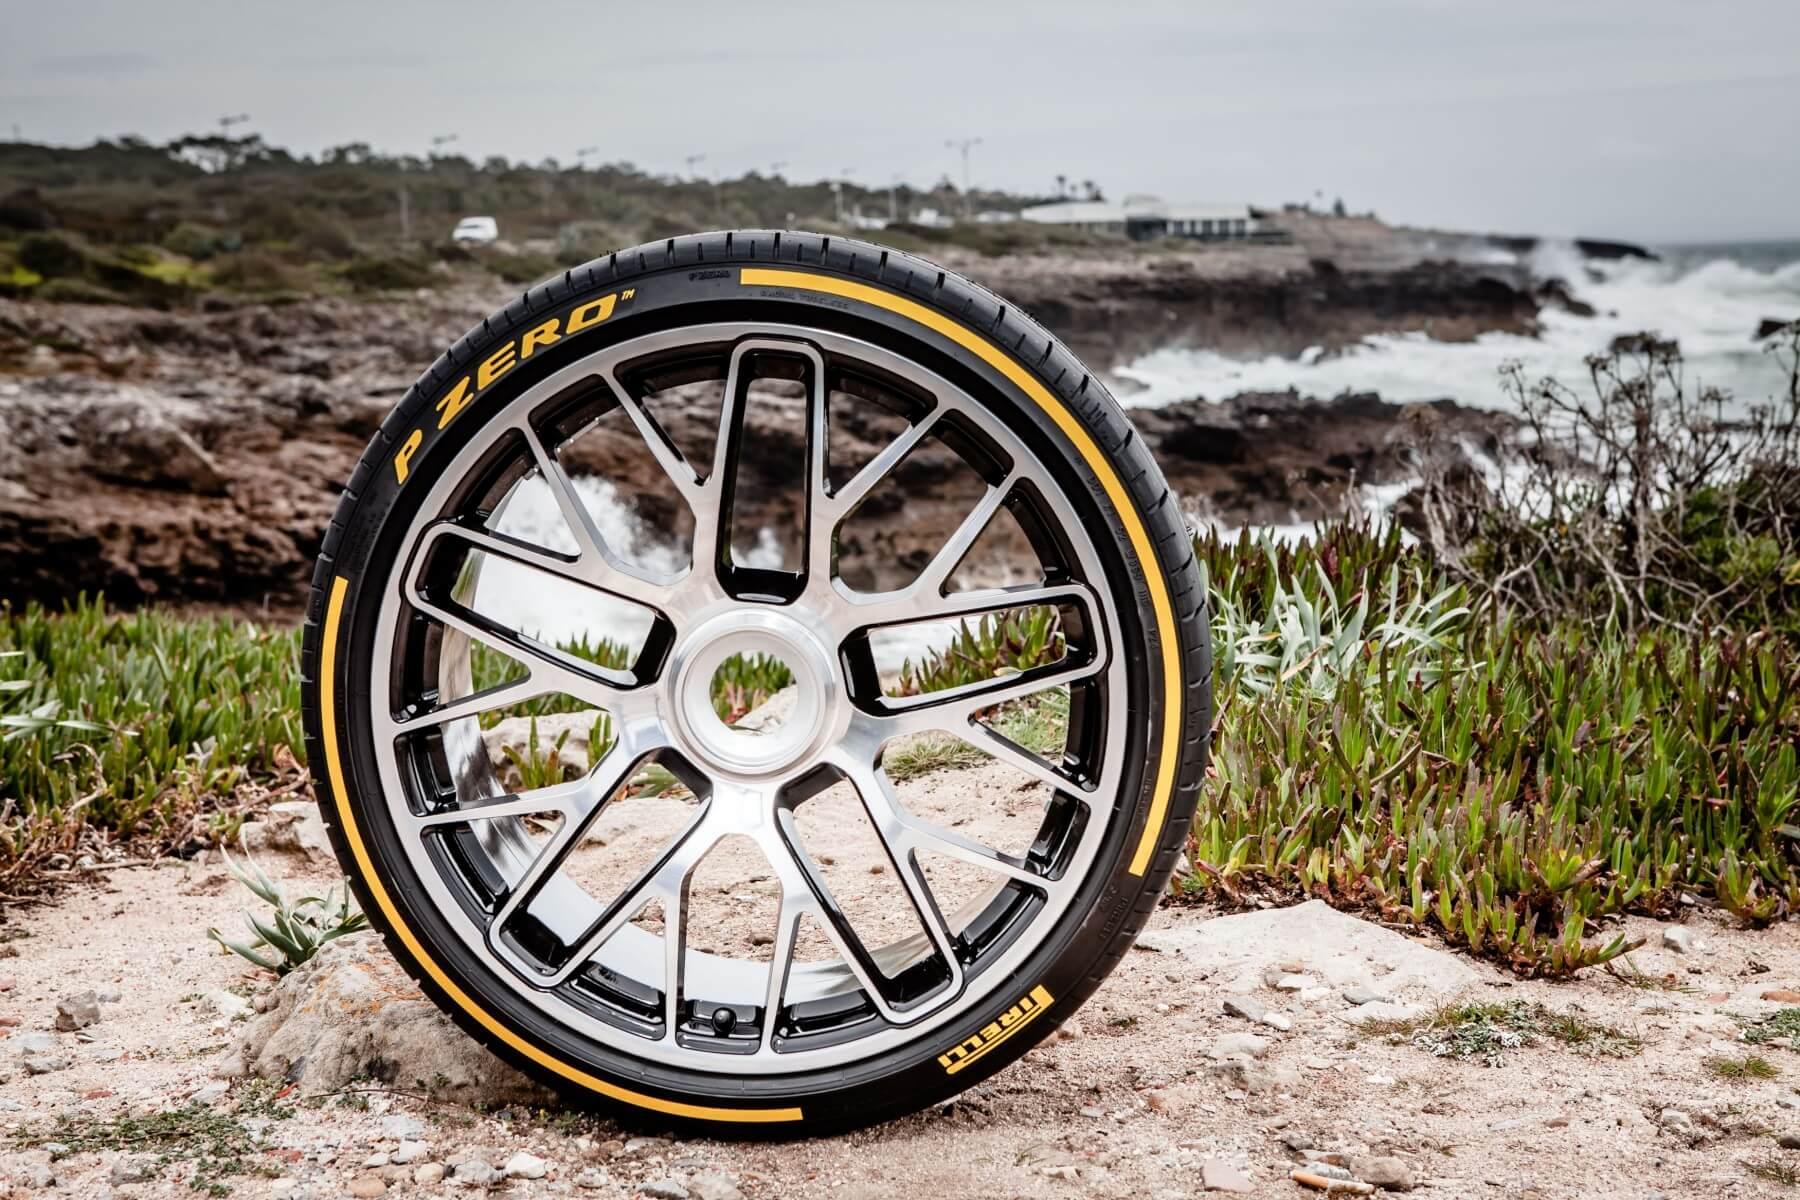 Cheap Vs Premium Tyres